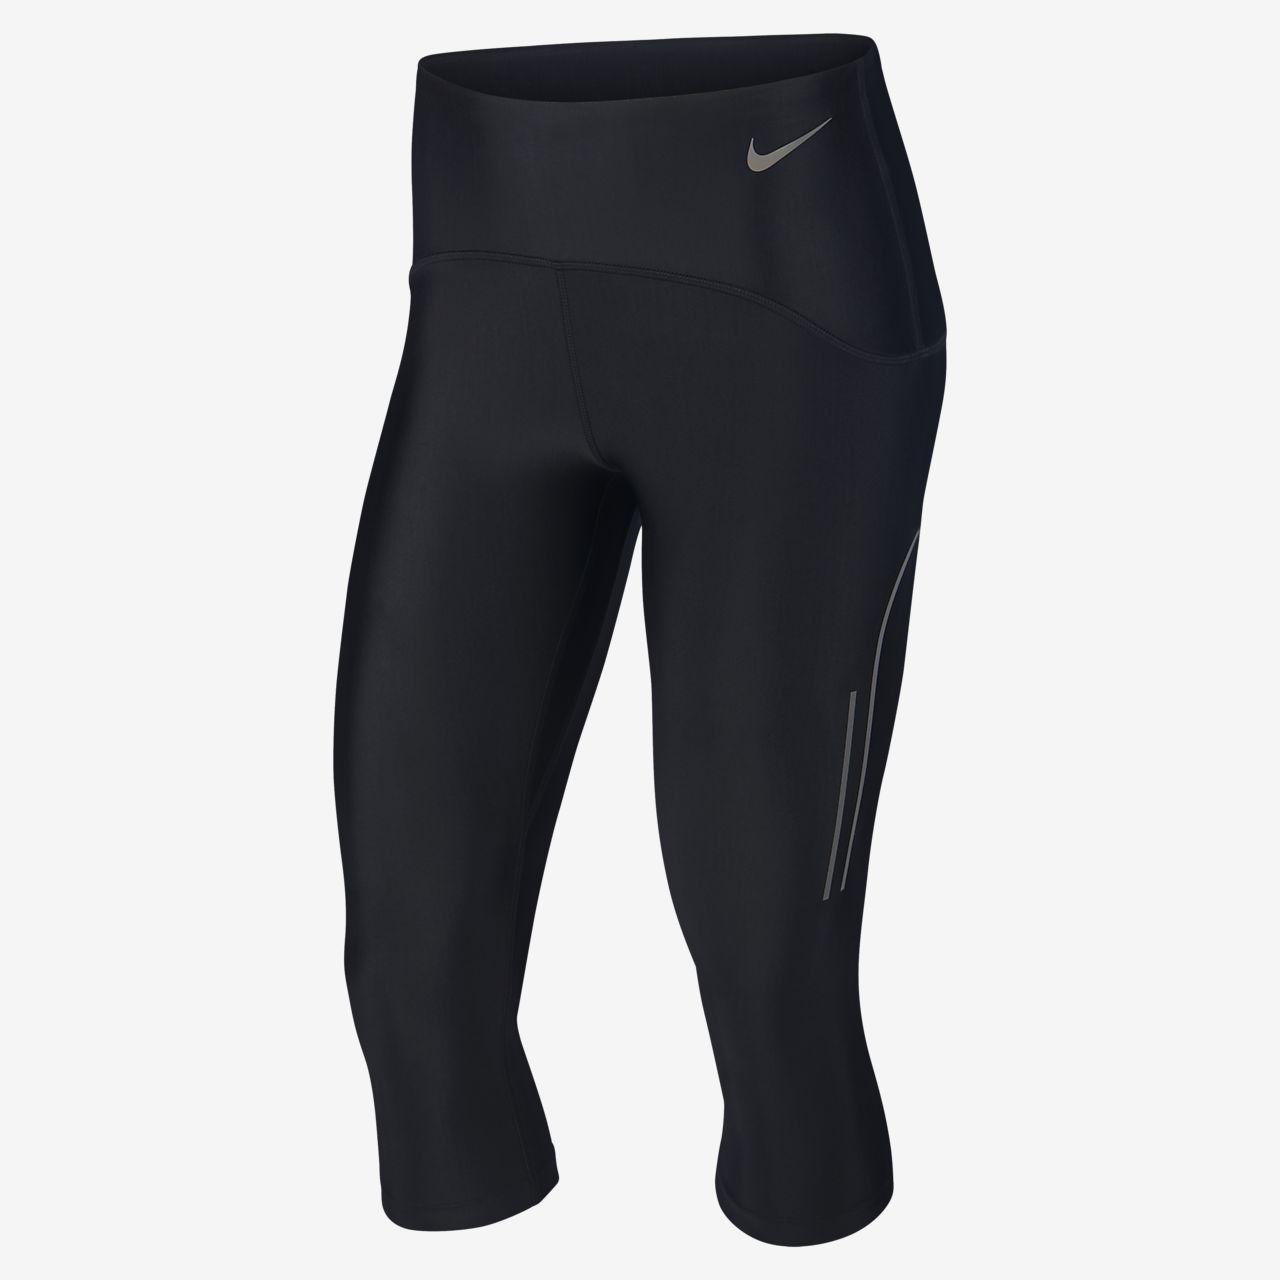 Pantalones capri de running para mujer Nike Speed